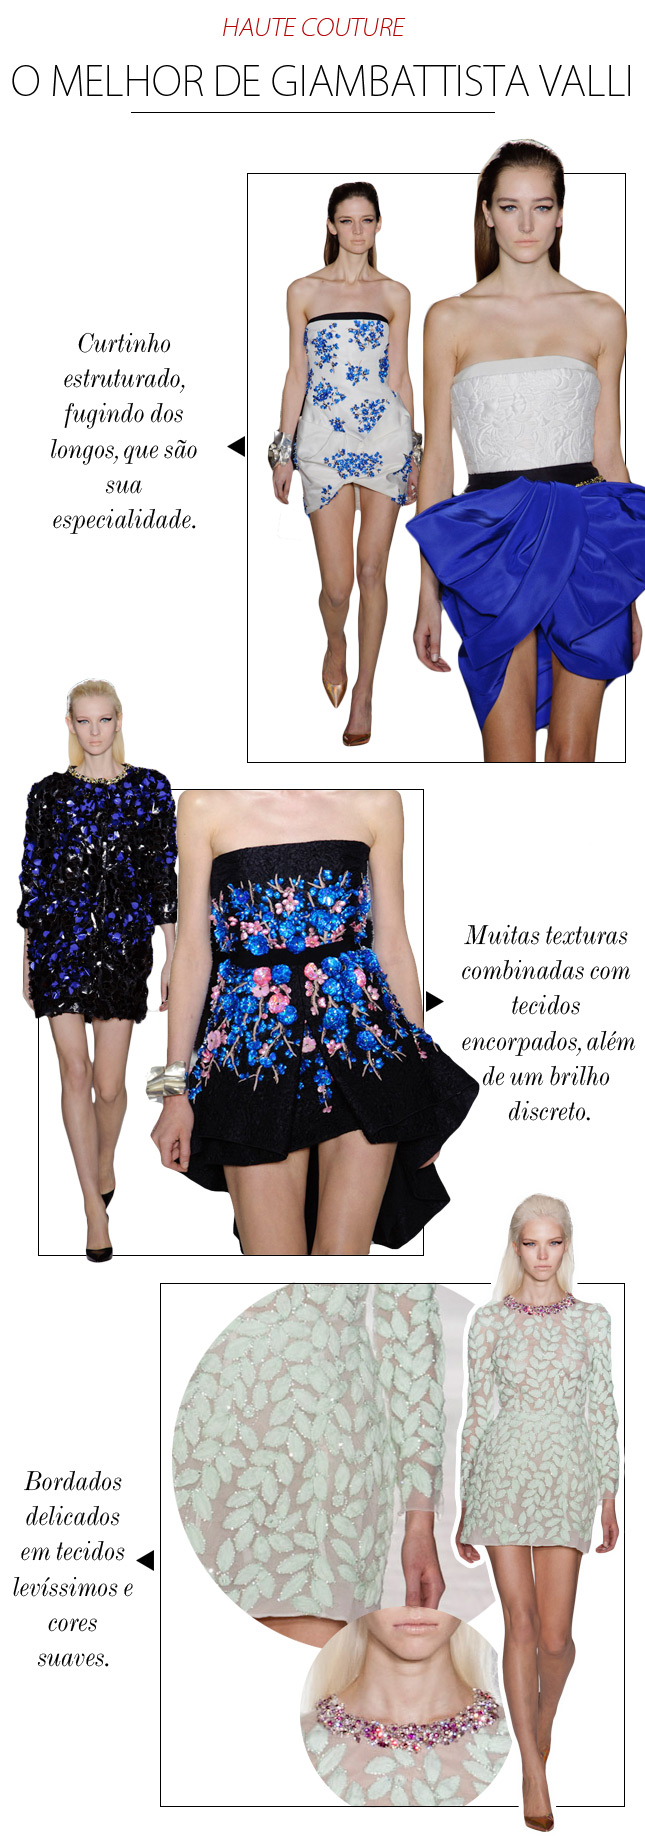 haute couture giambattista valli  desfile blog de moda oh my closet alta costura vestido de festa vestido longo looks passarela